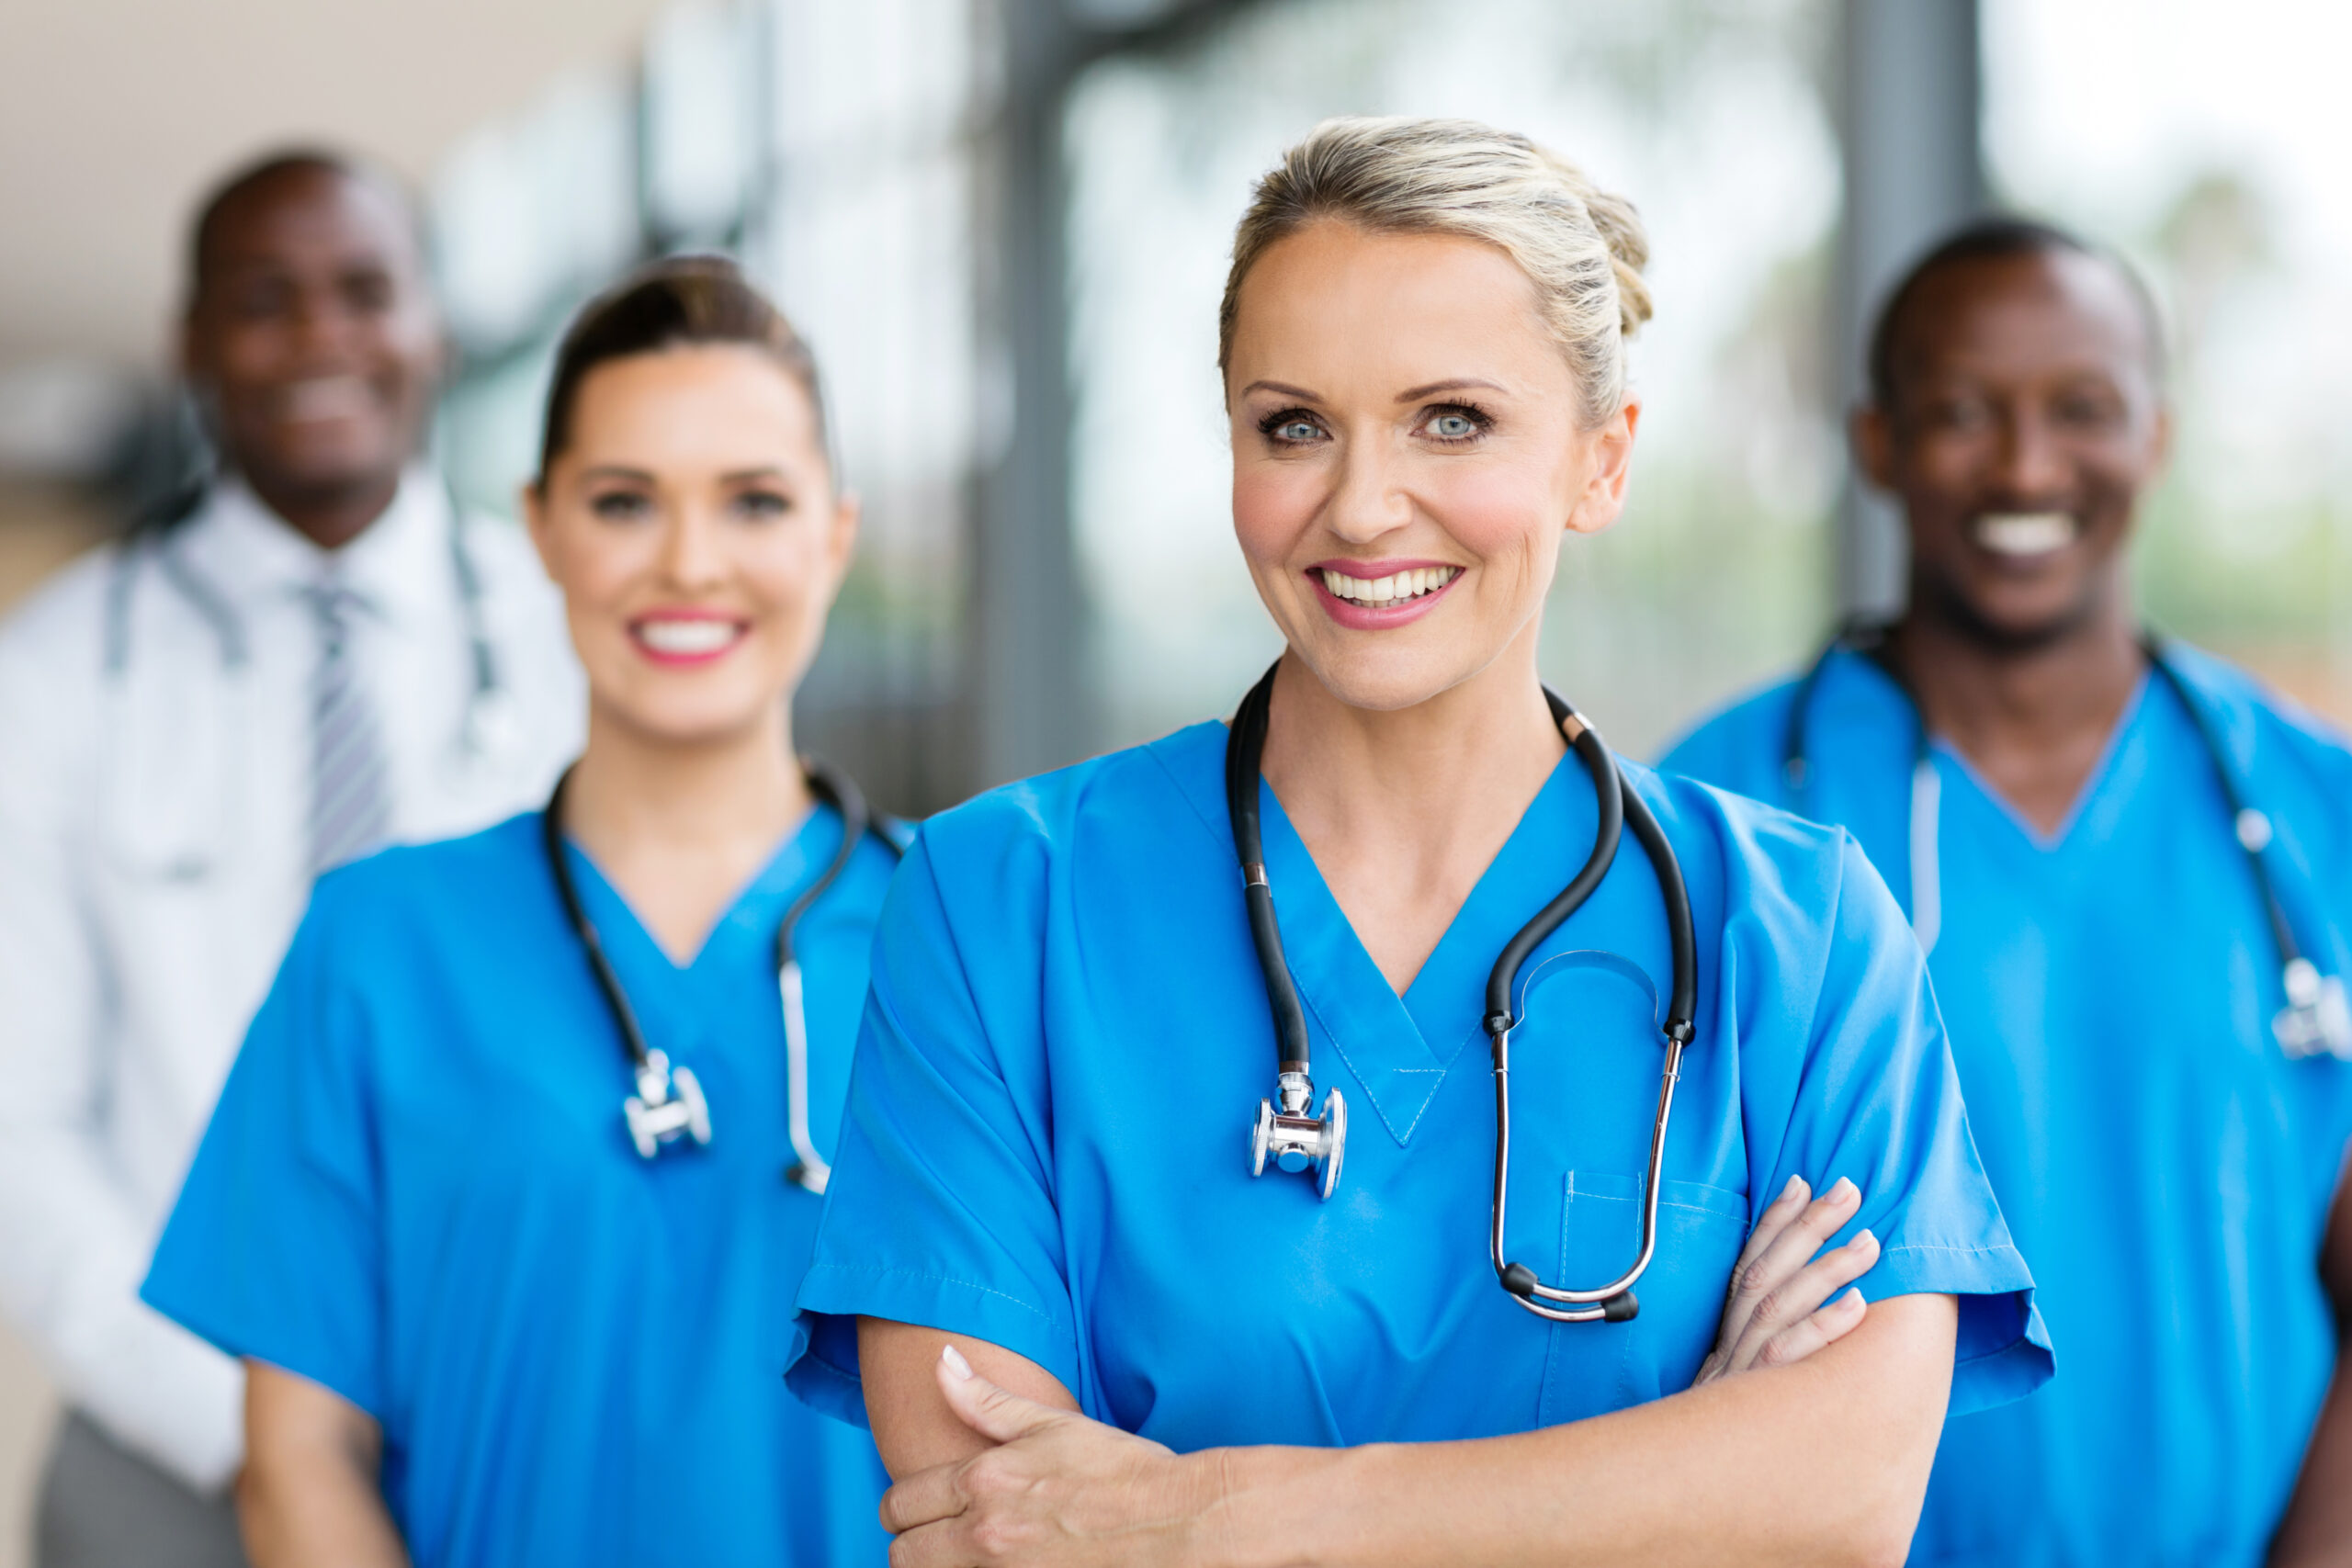 female medical doctor